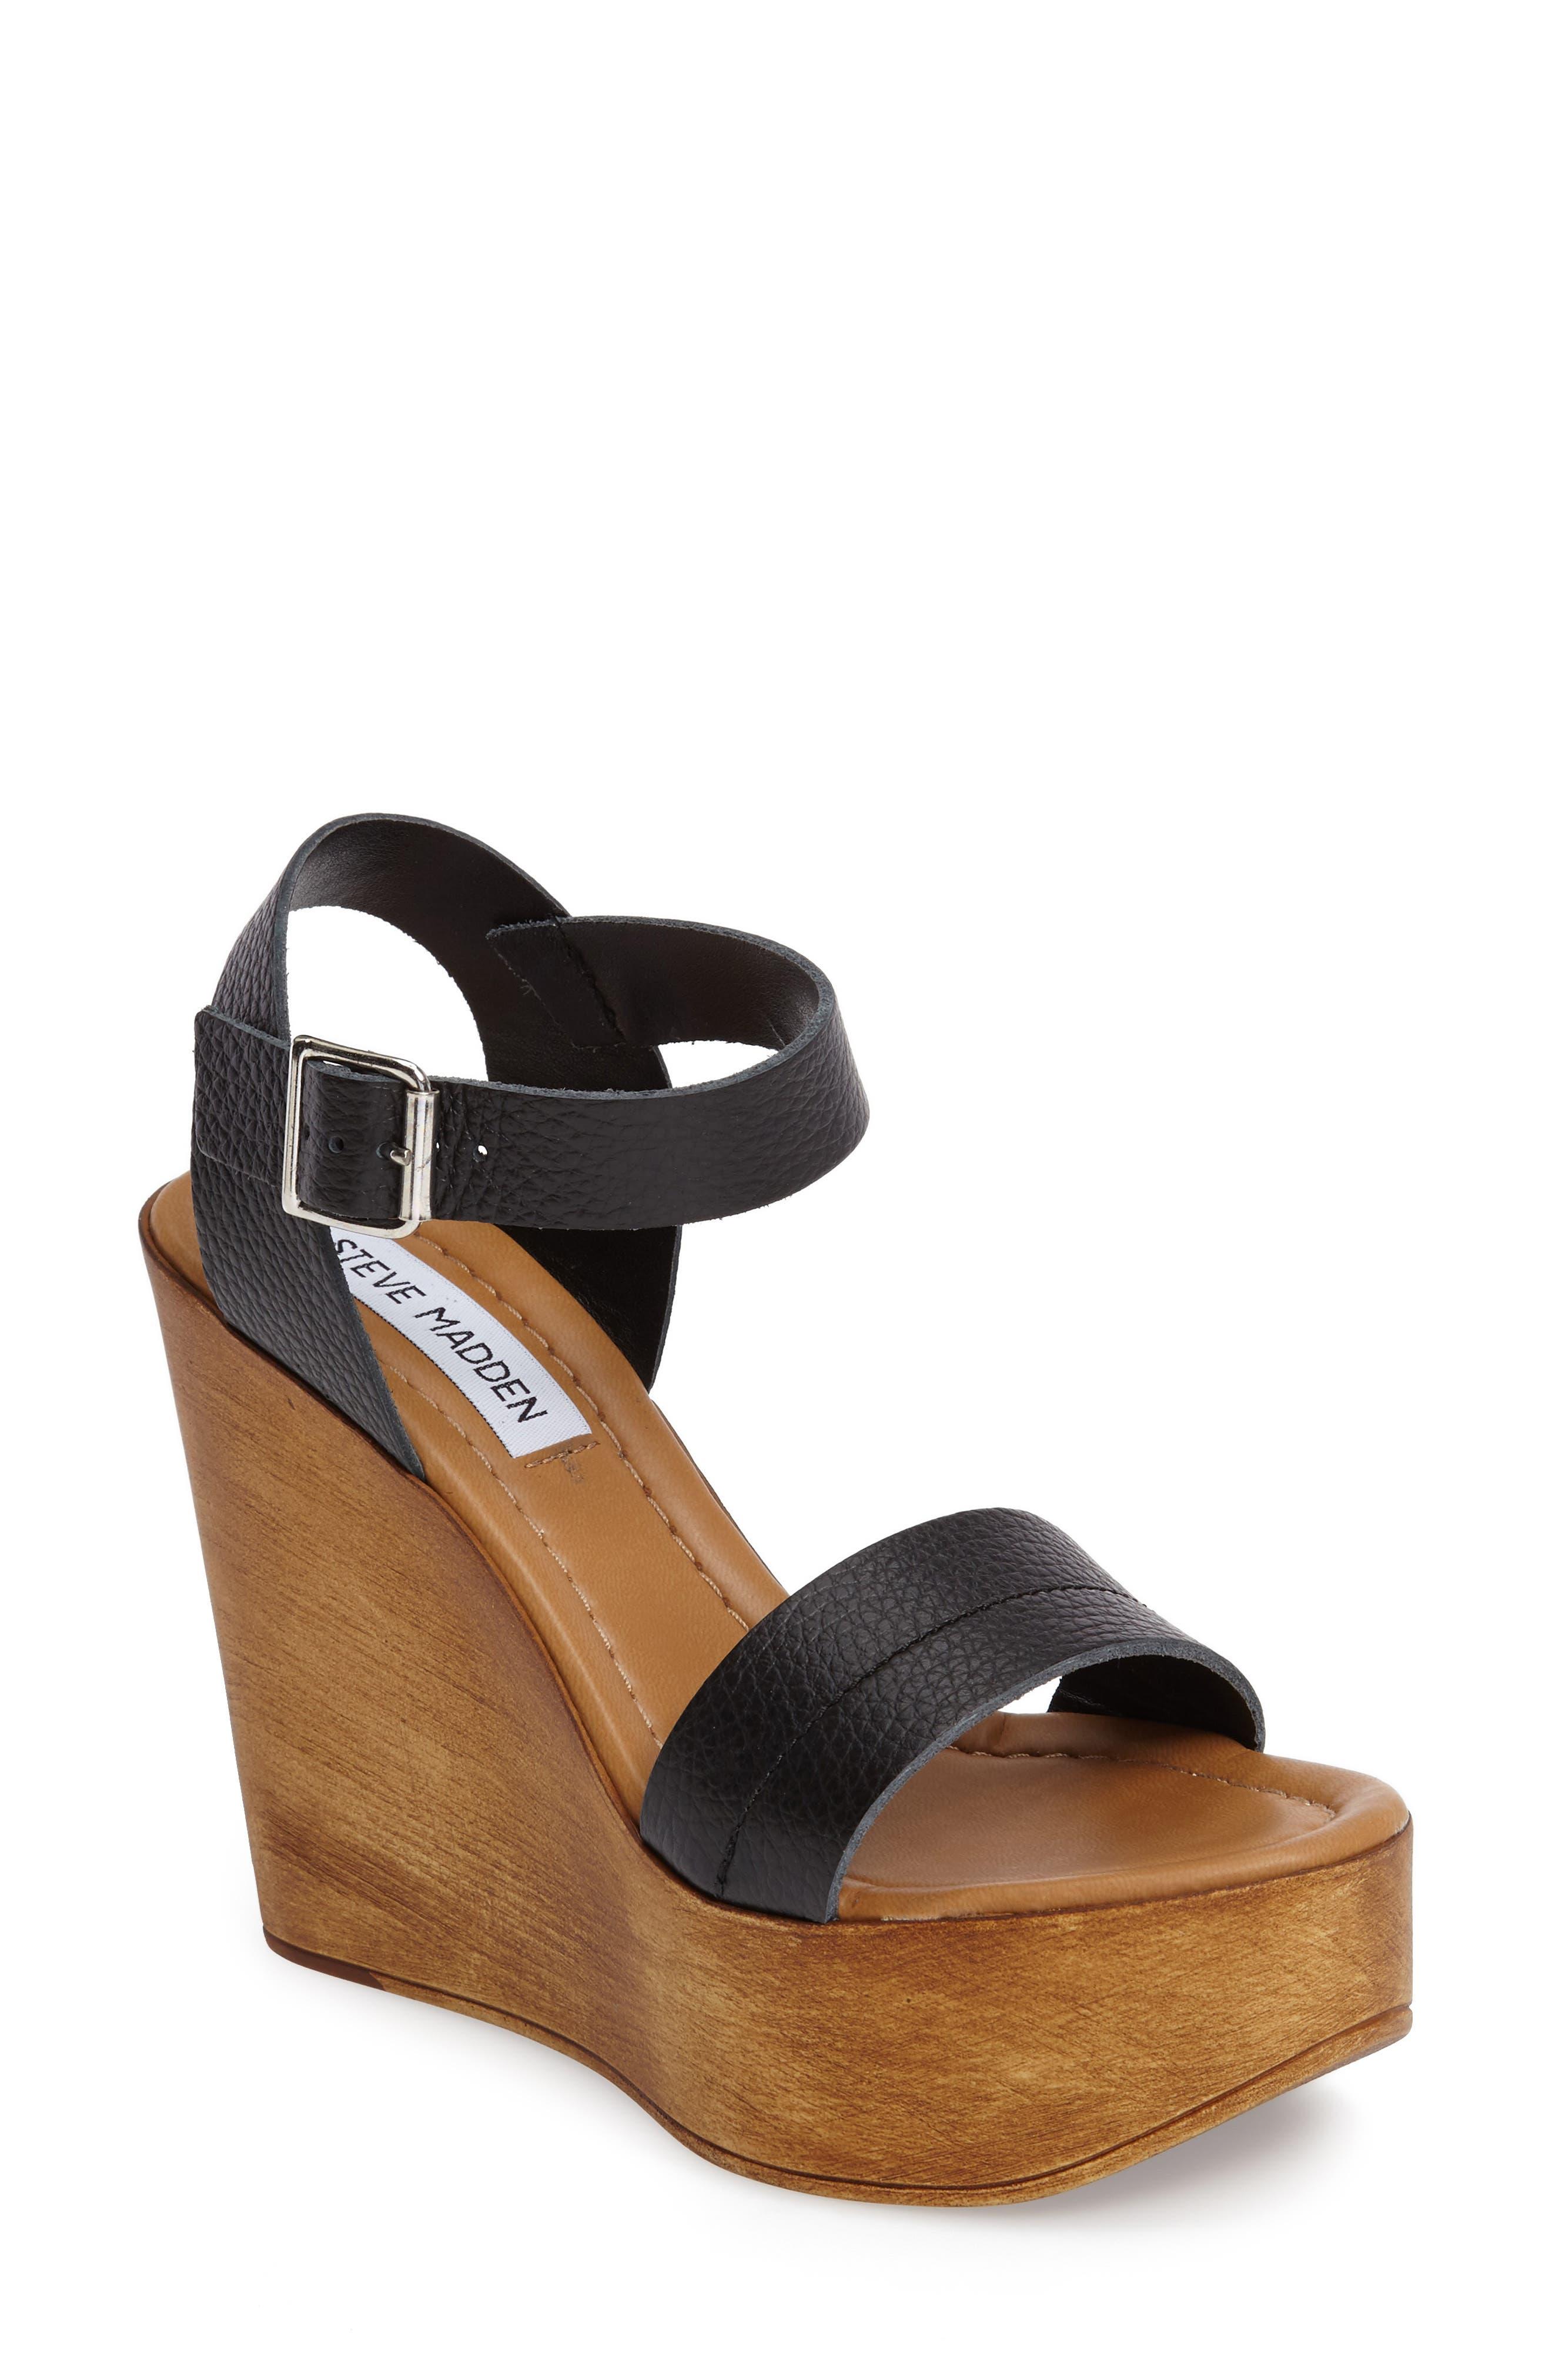 Belma Wedge Sandal,                             Main thumbnail 1, color,                             Black Leather